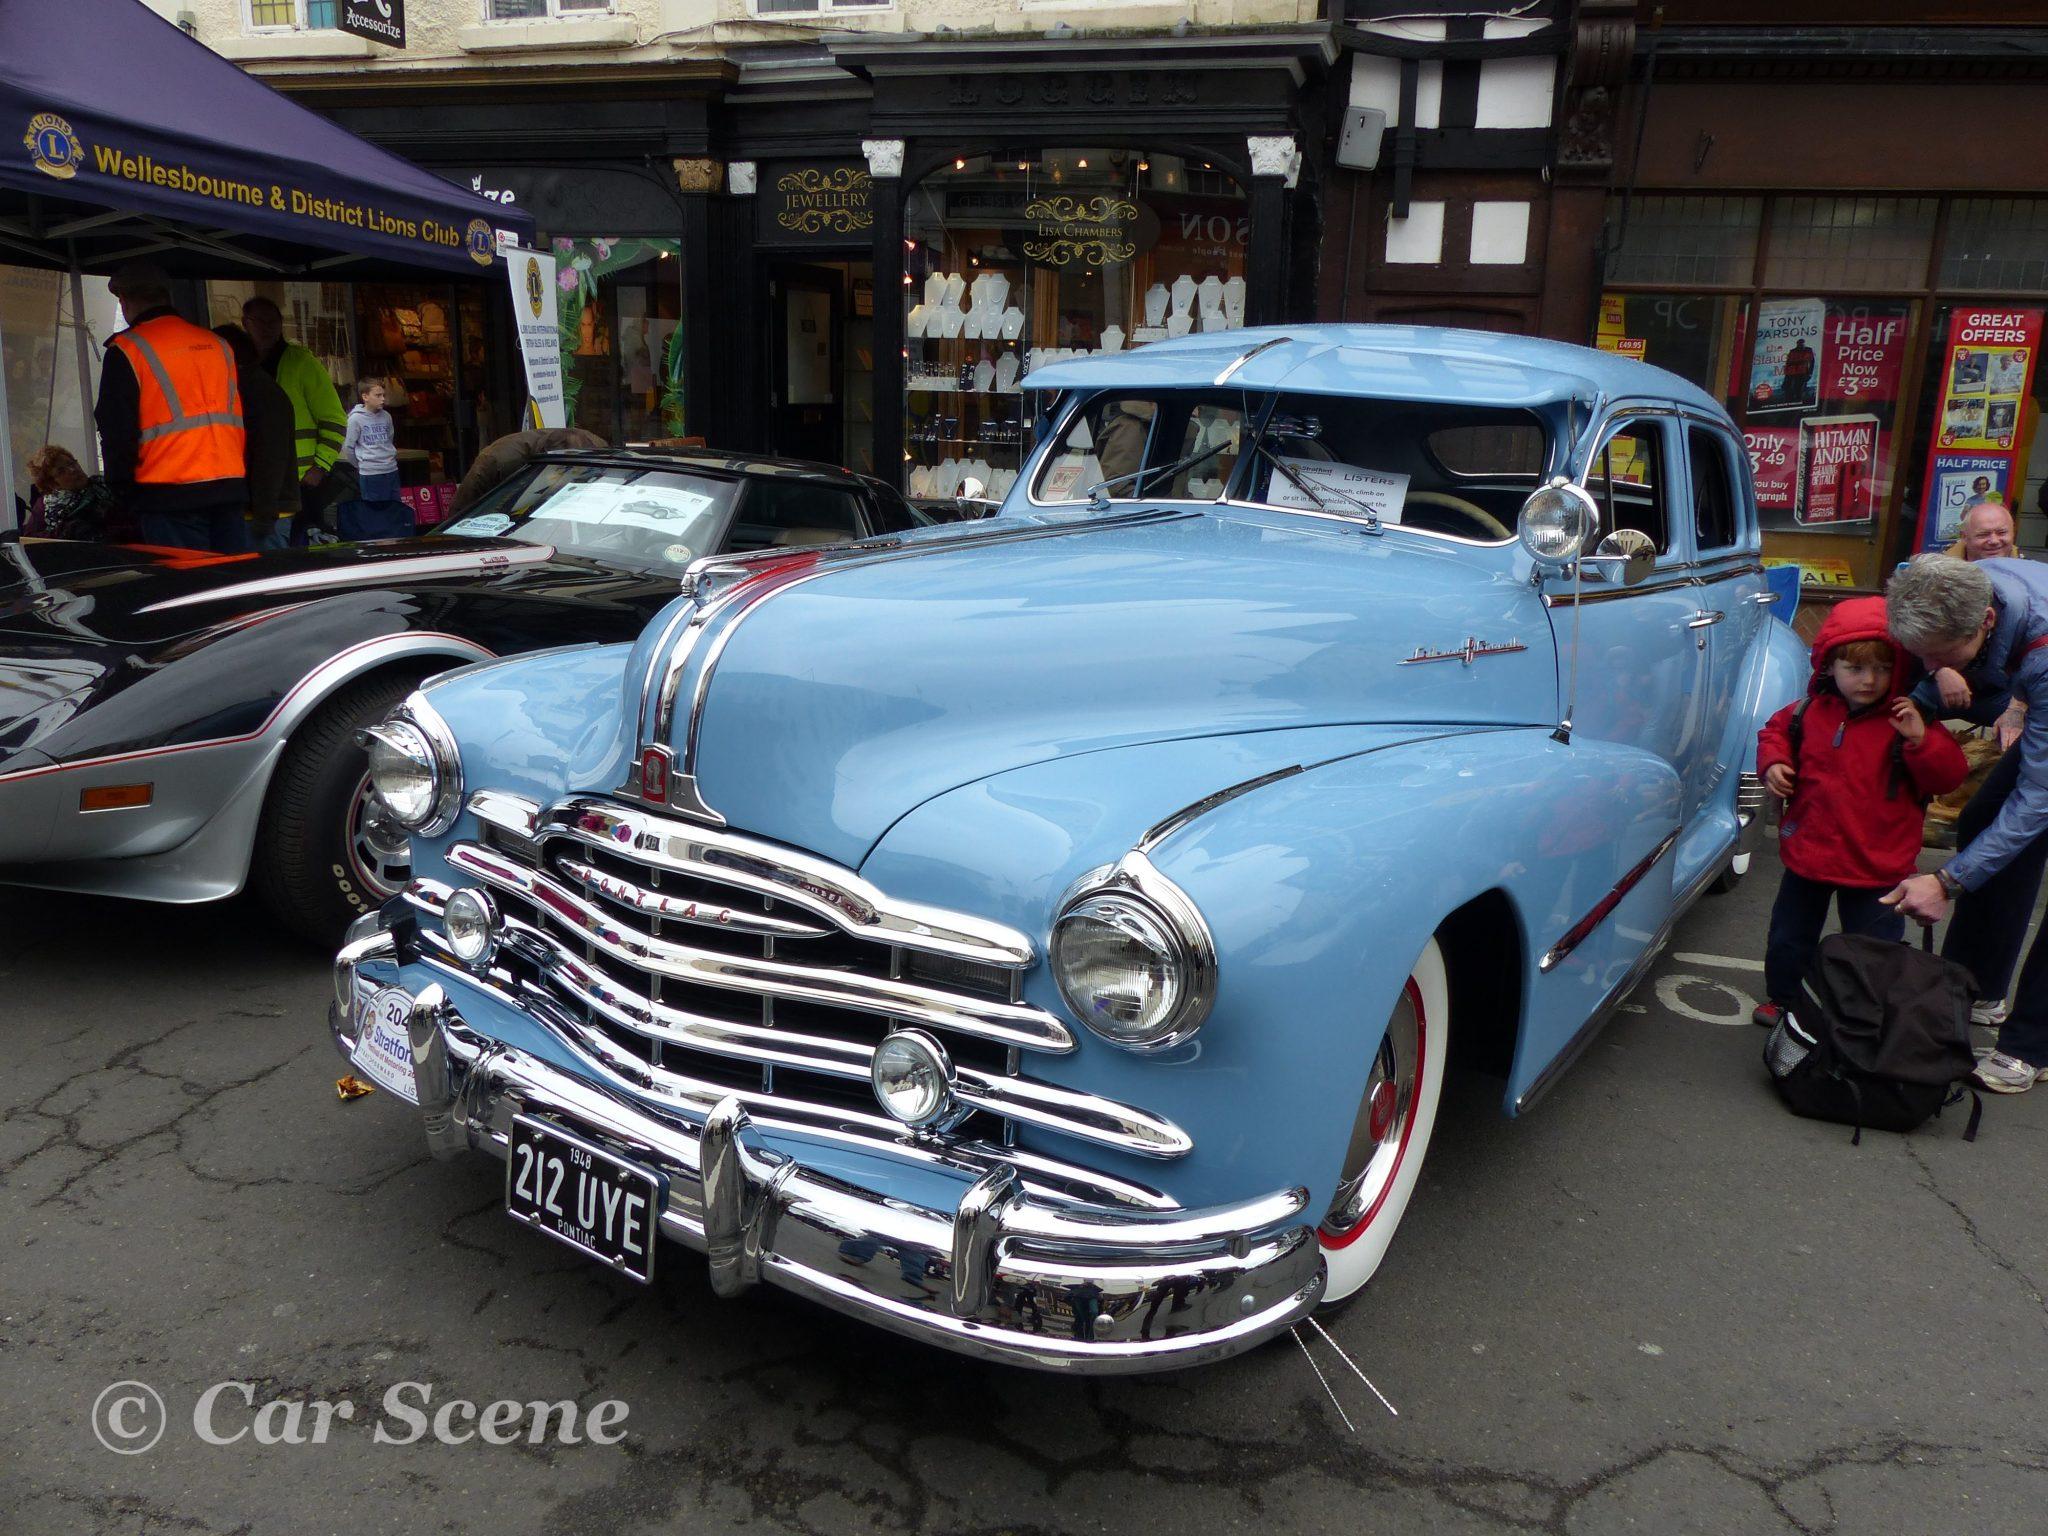 1948 Pontiac Silver Streak front view